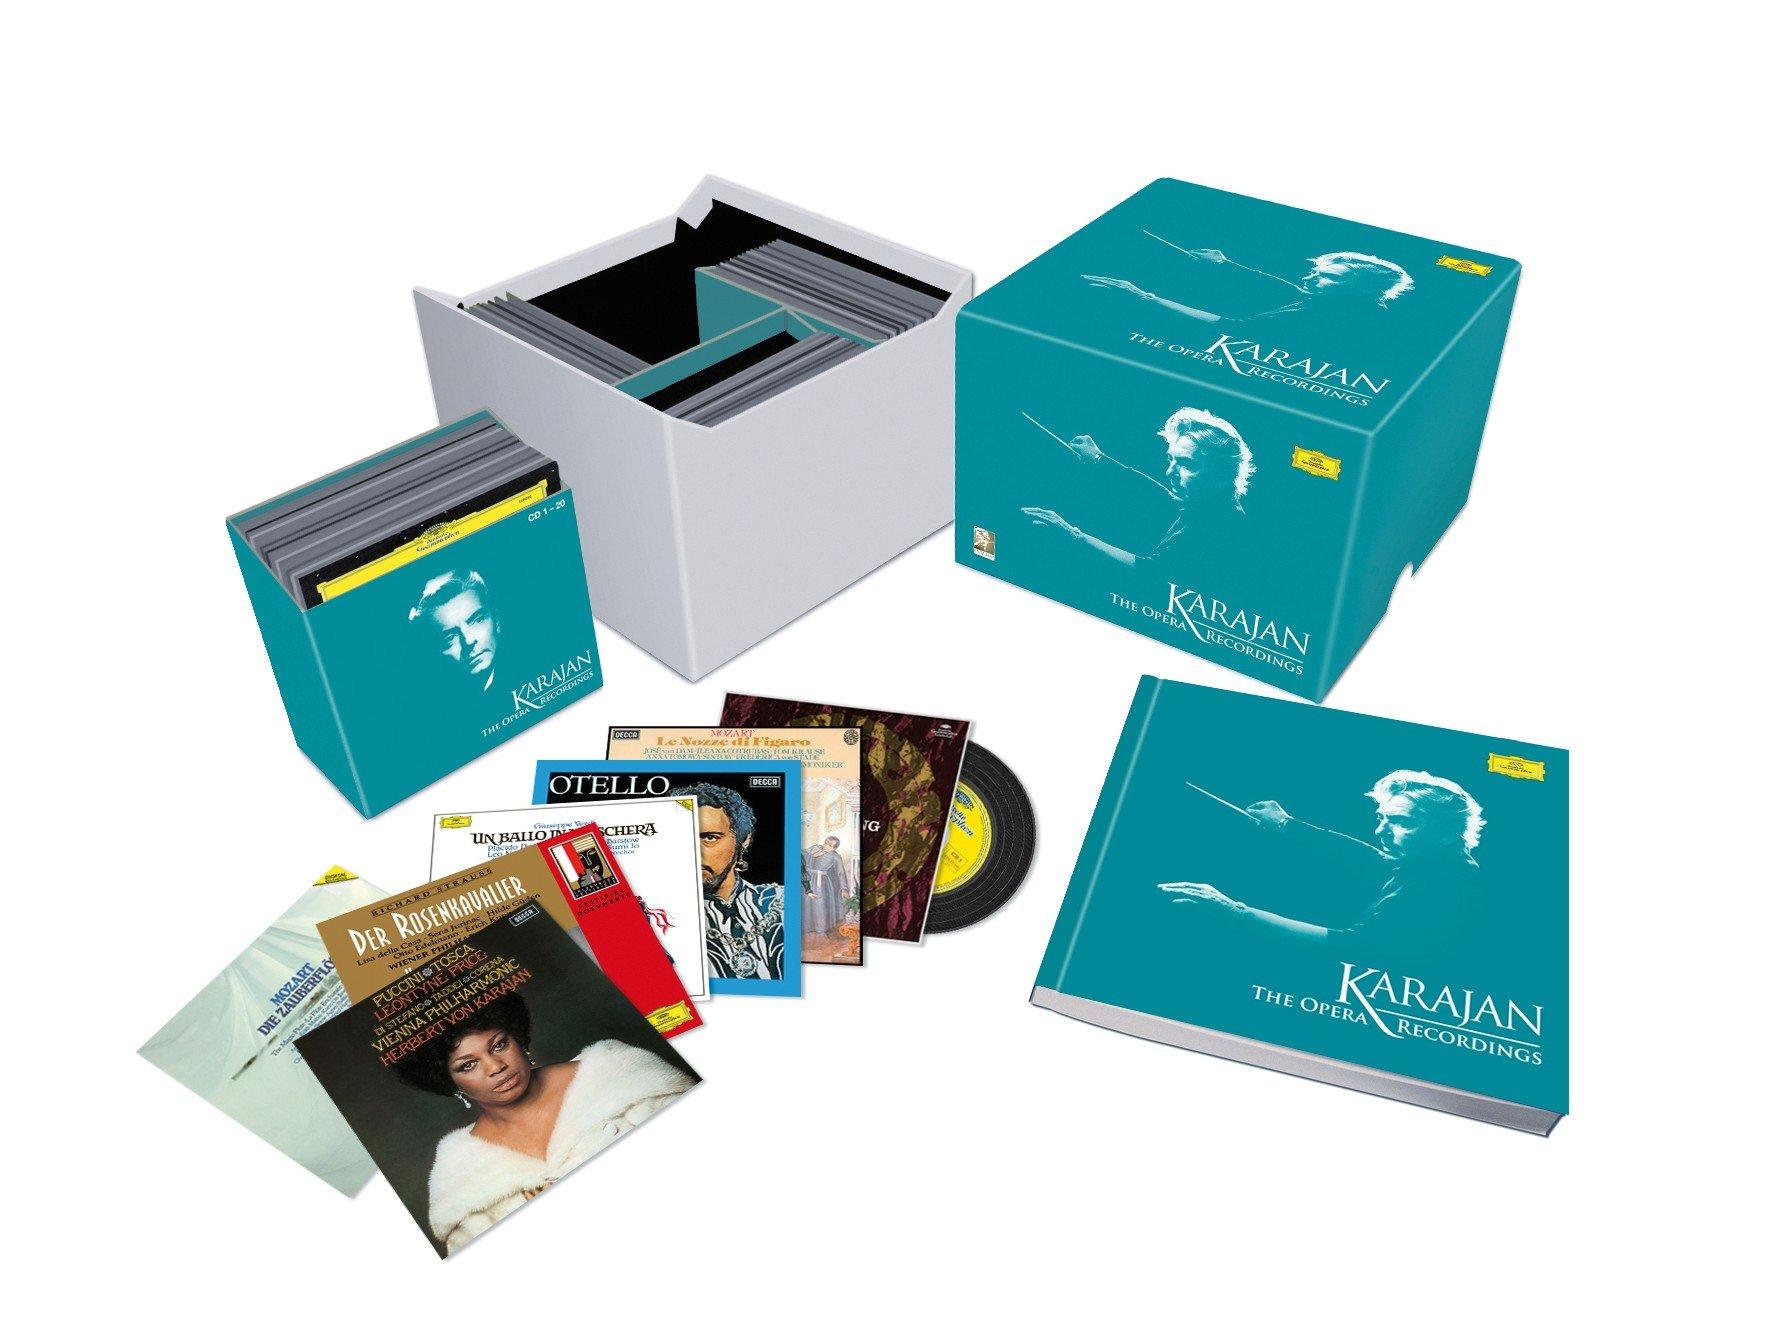 Karajan: The Opera Recordings by Deutsche Grammophon